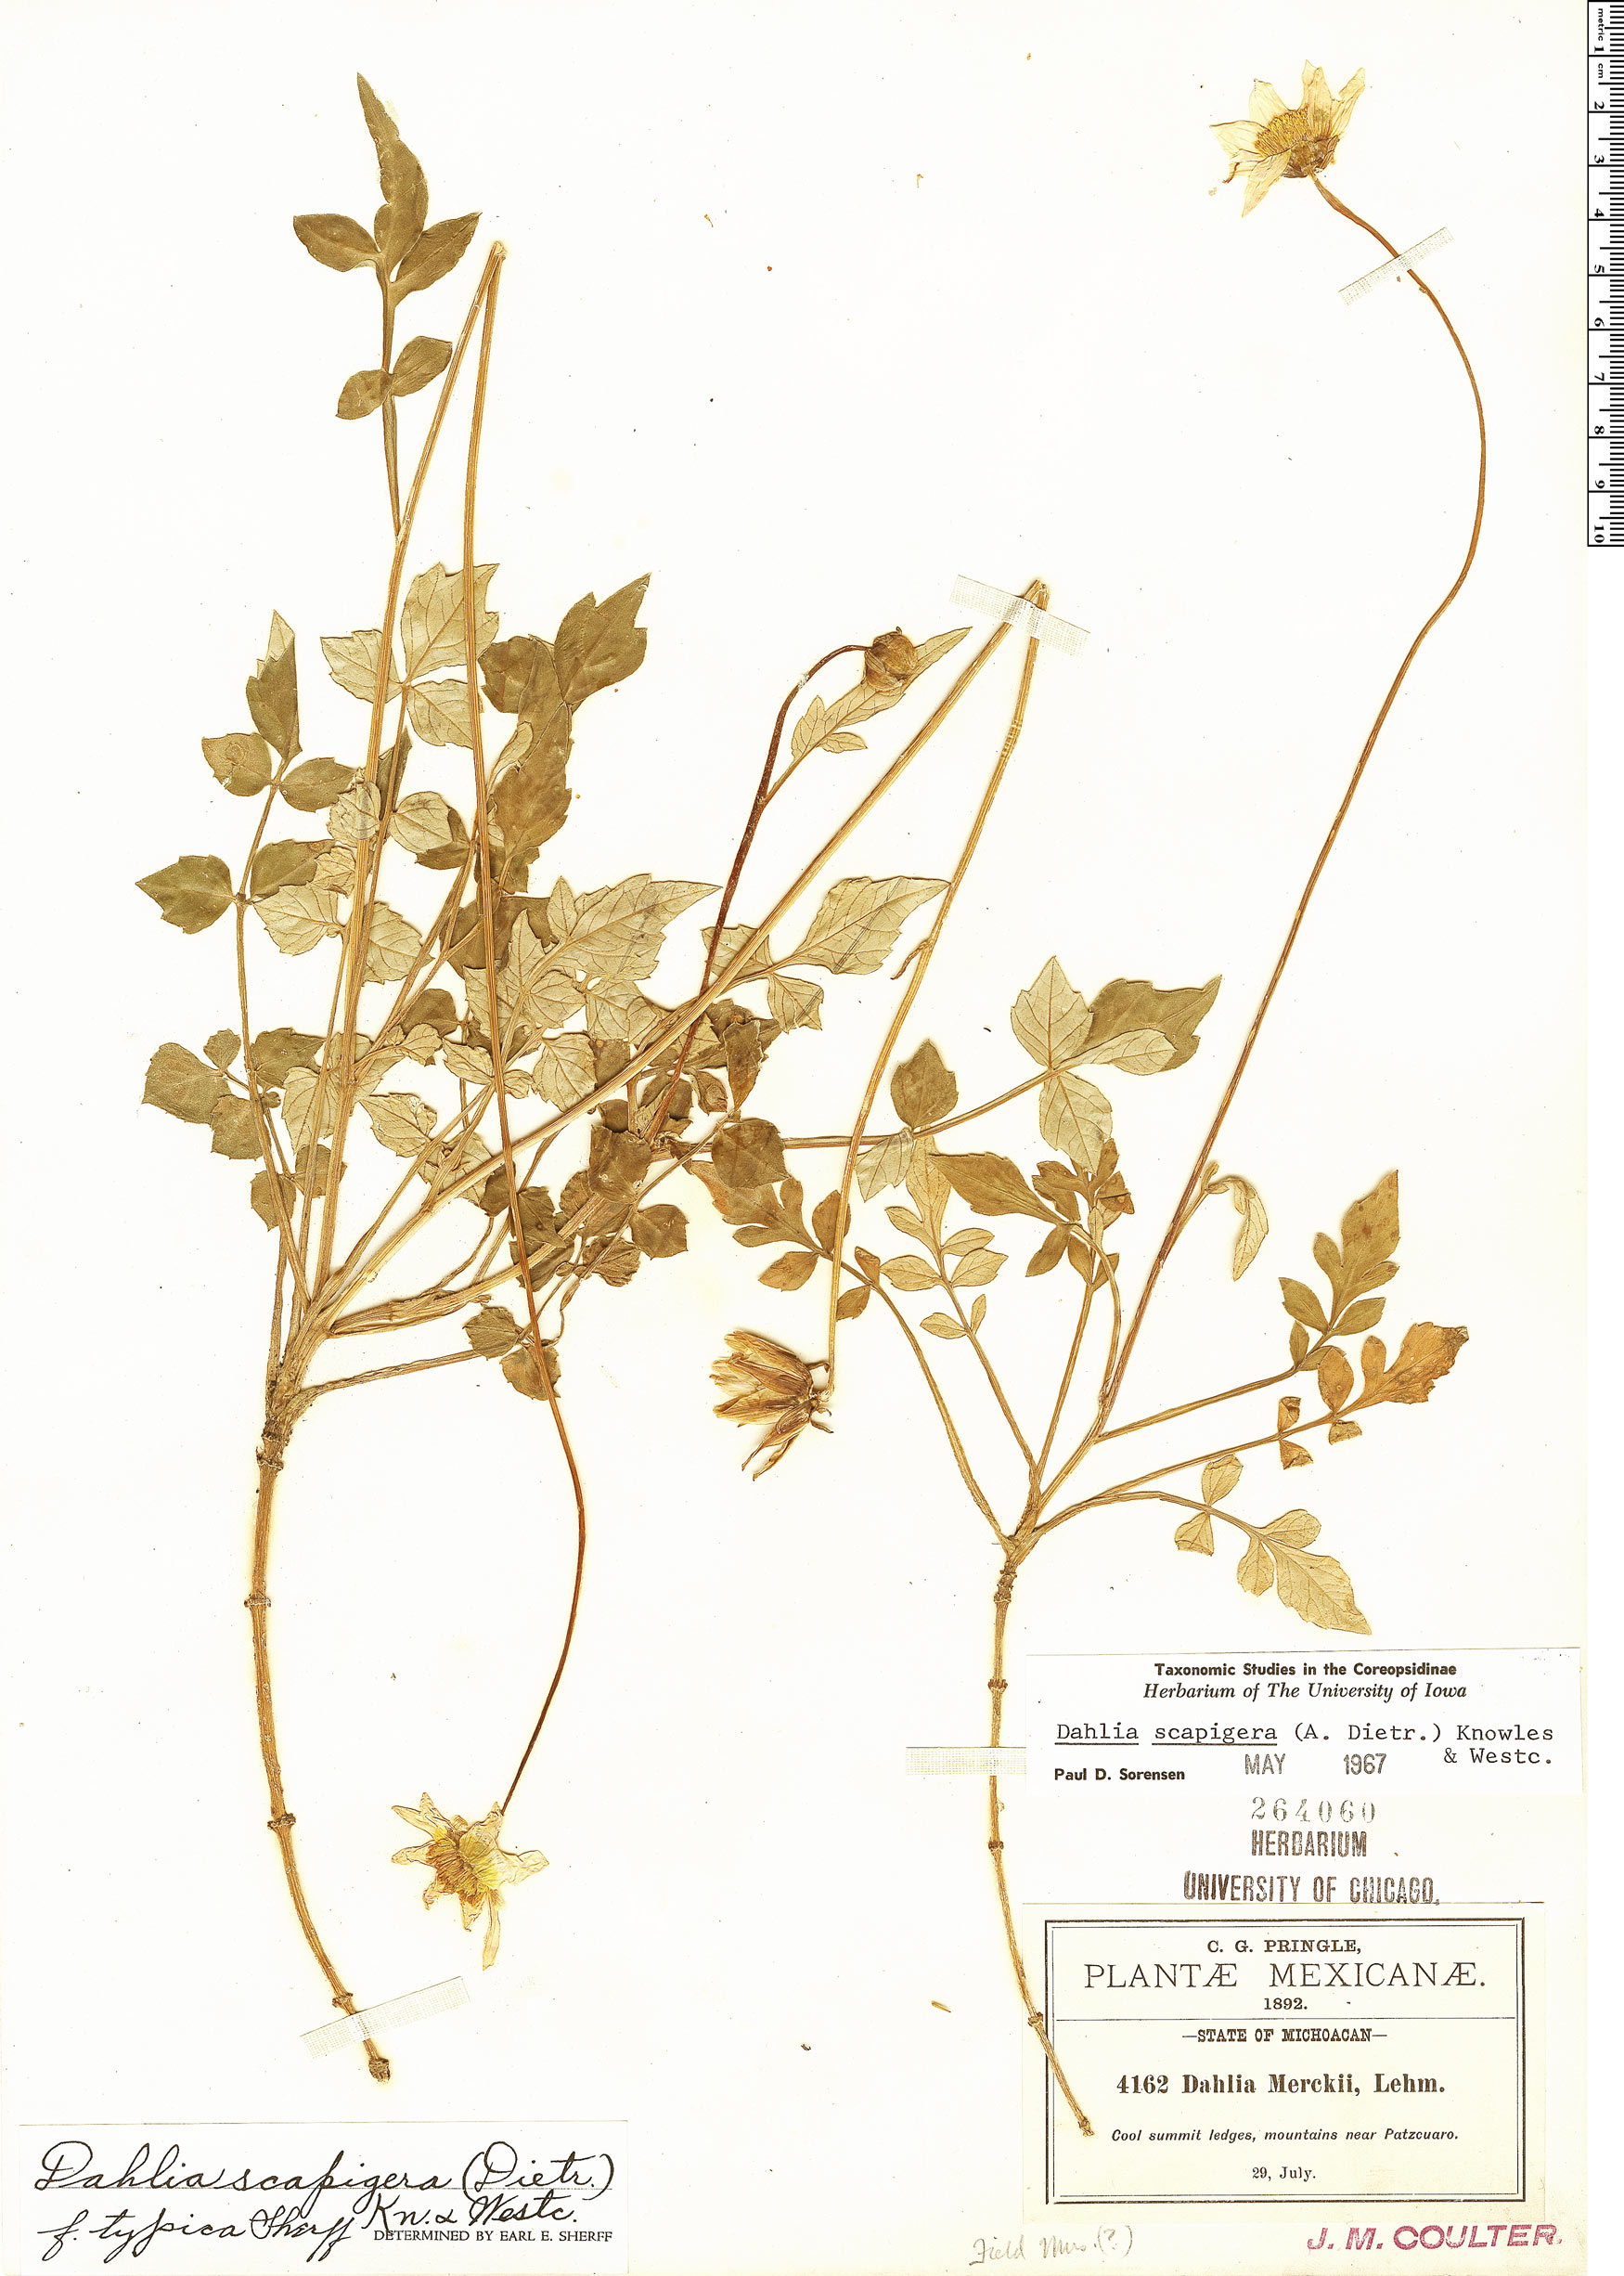 Specimen: Dahlia scapigera